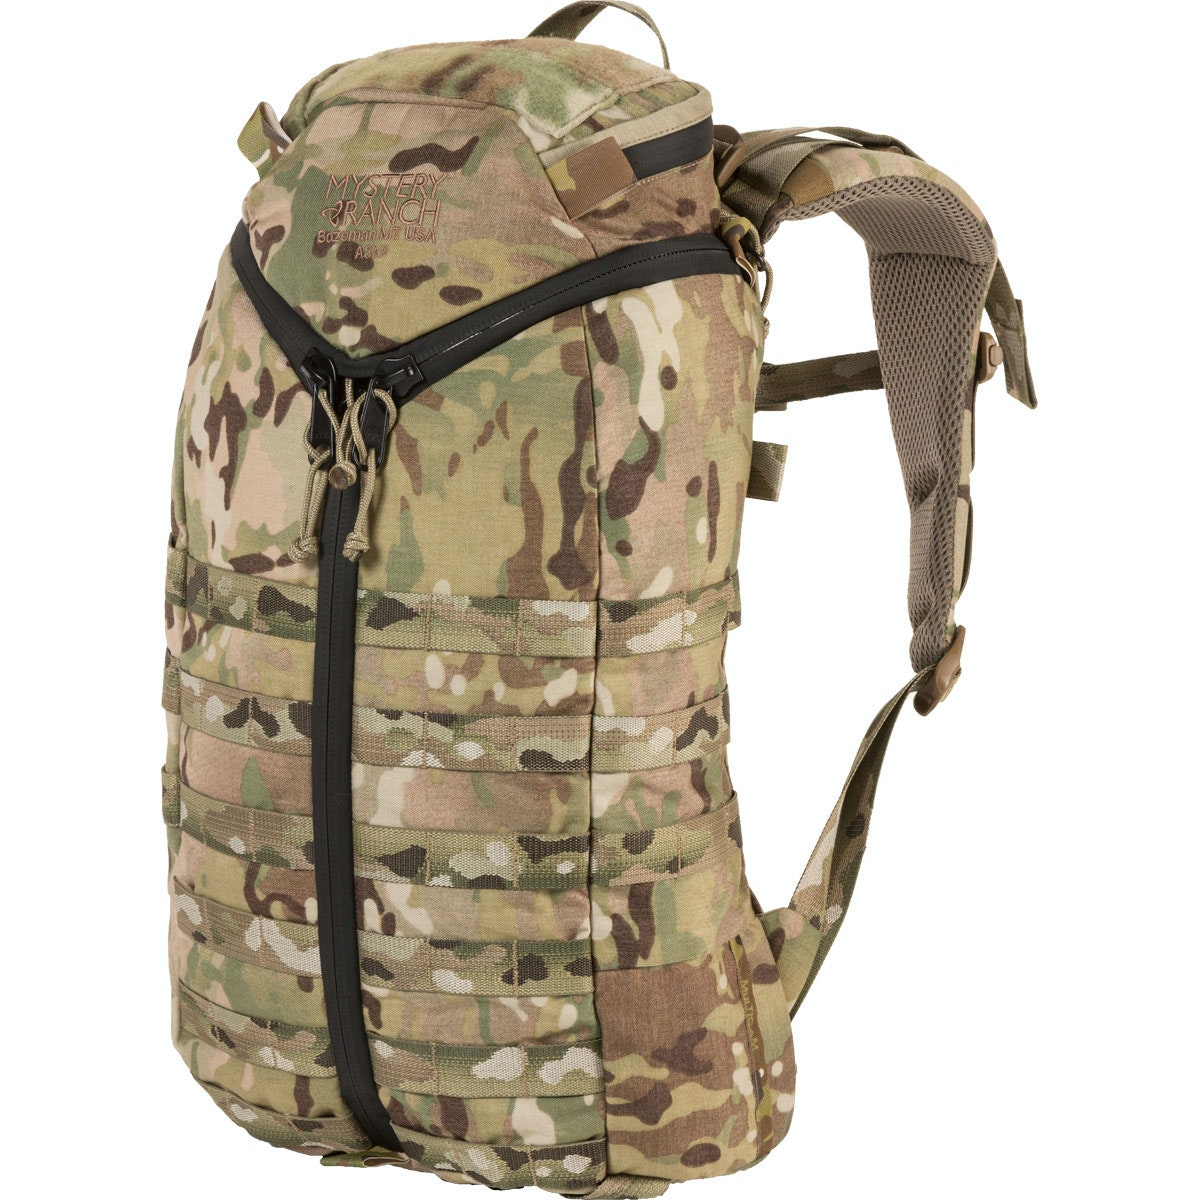 ASAP Pack | Mystery Ranch Backpacks